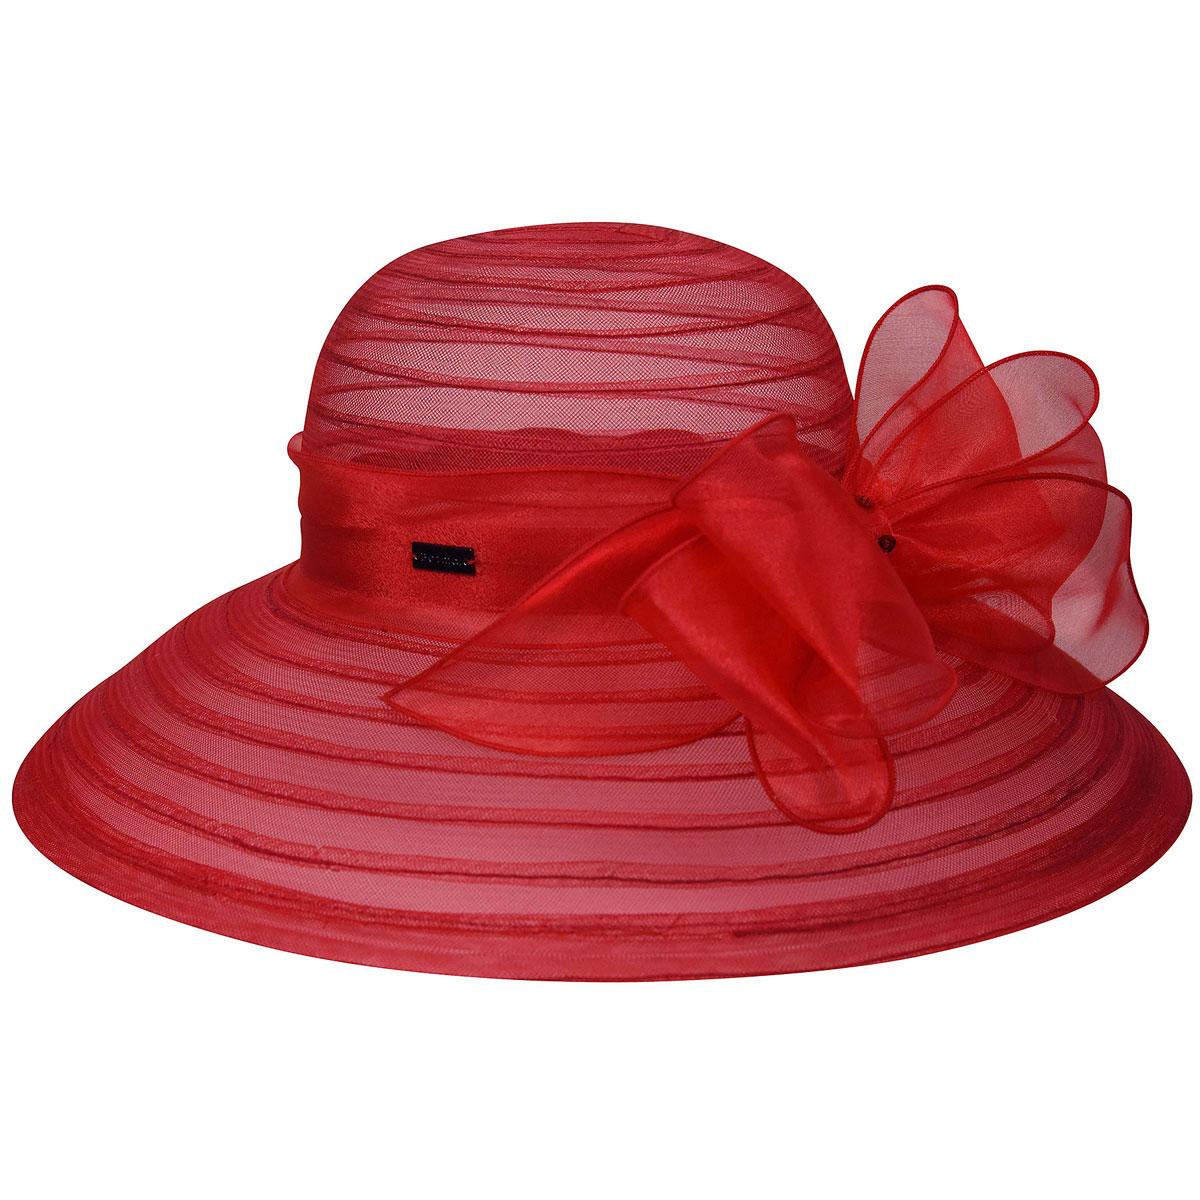 Betmar Valentina Asymmetric Wide Brim Occasion Hat in Scarlet